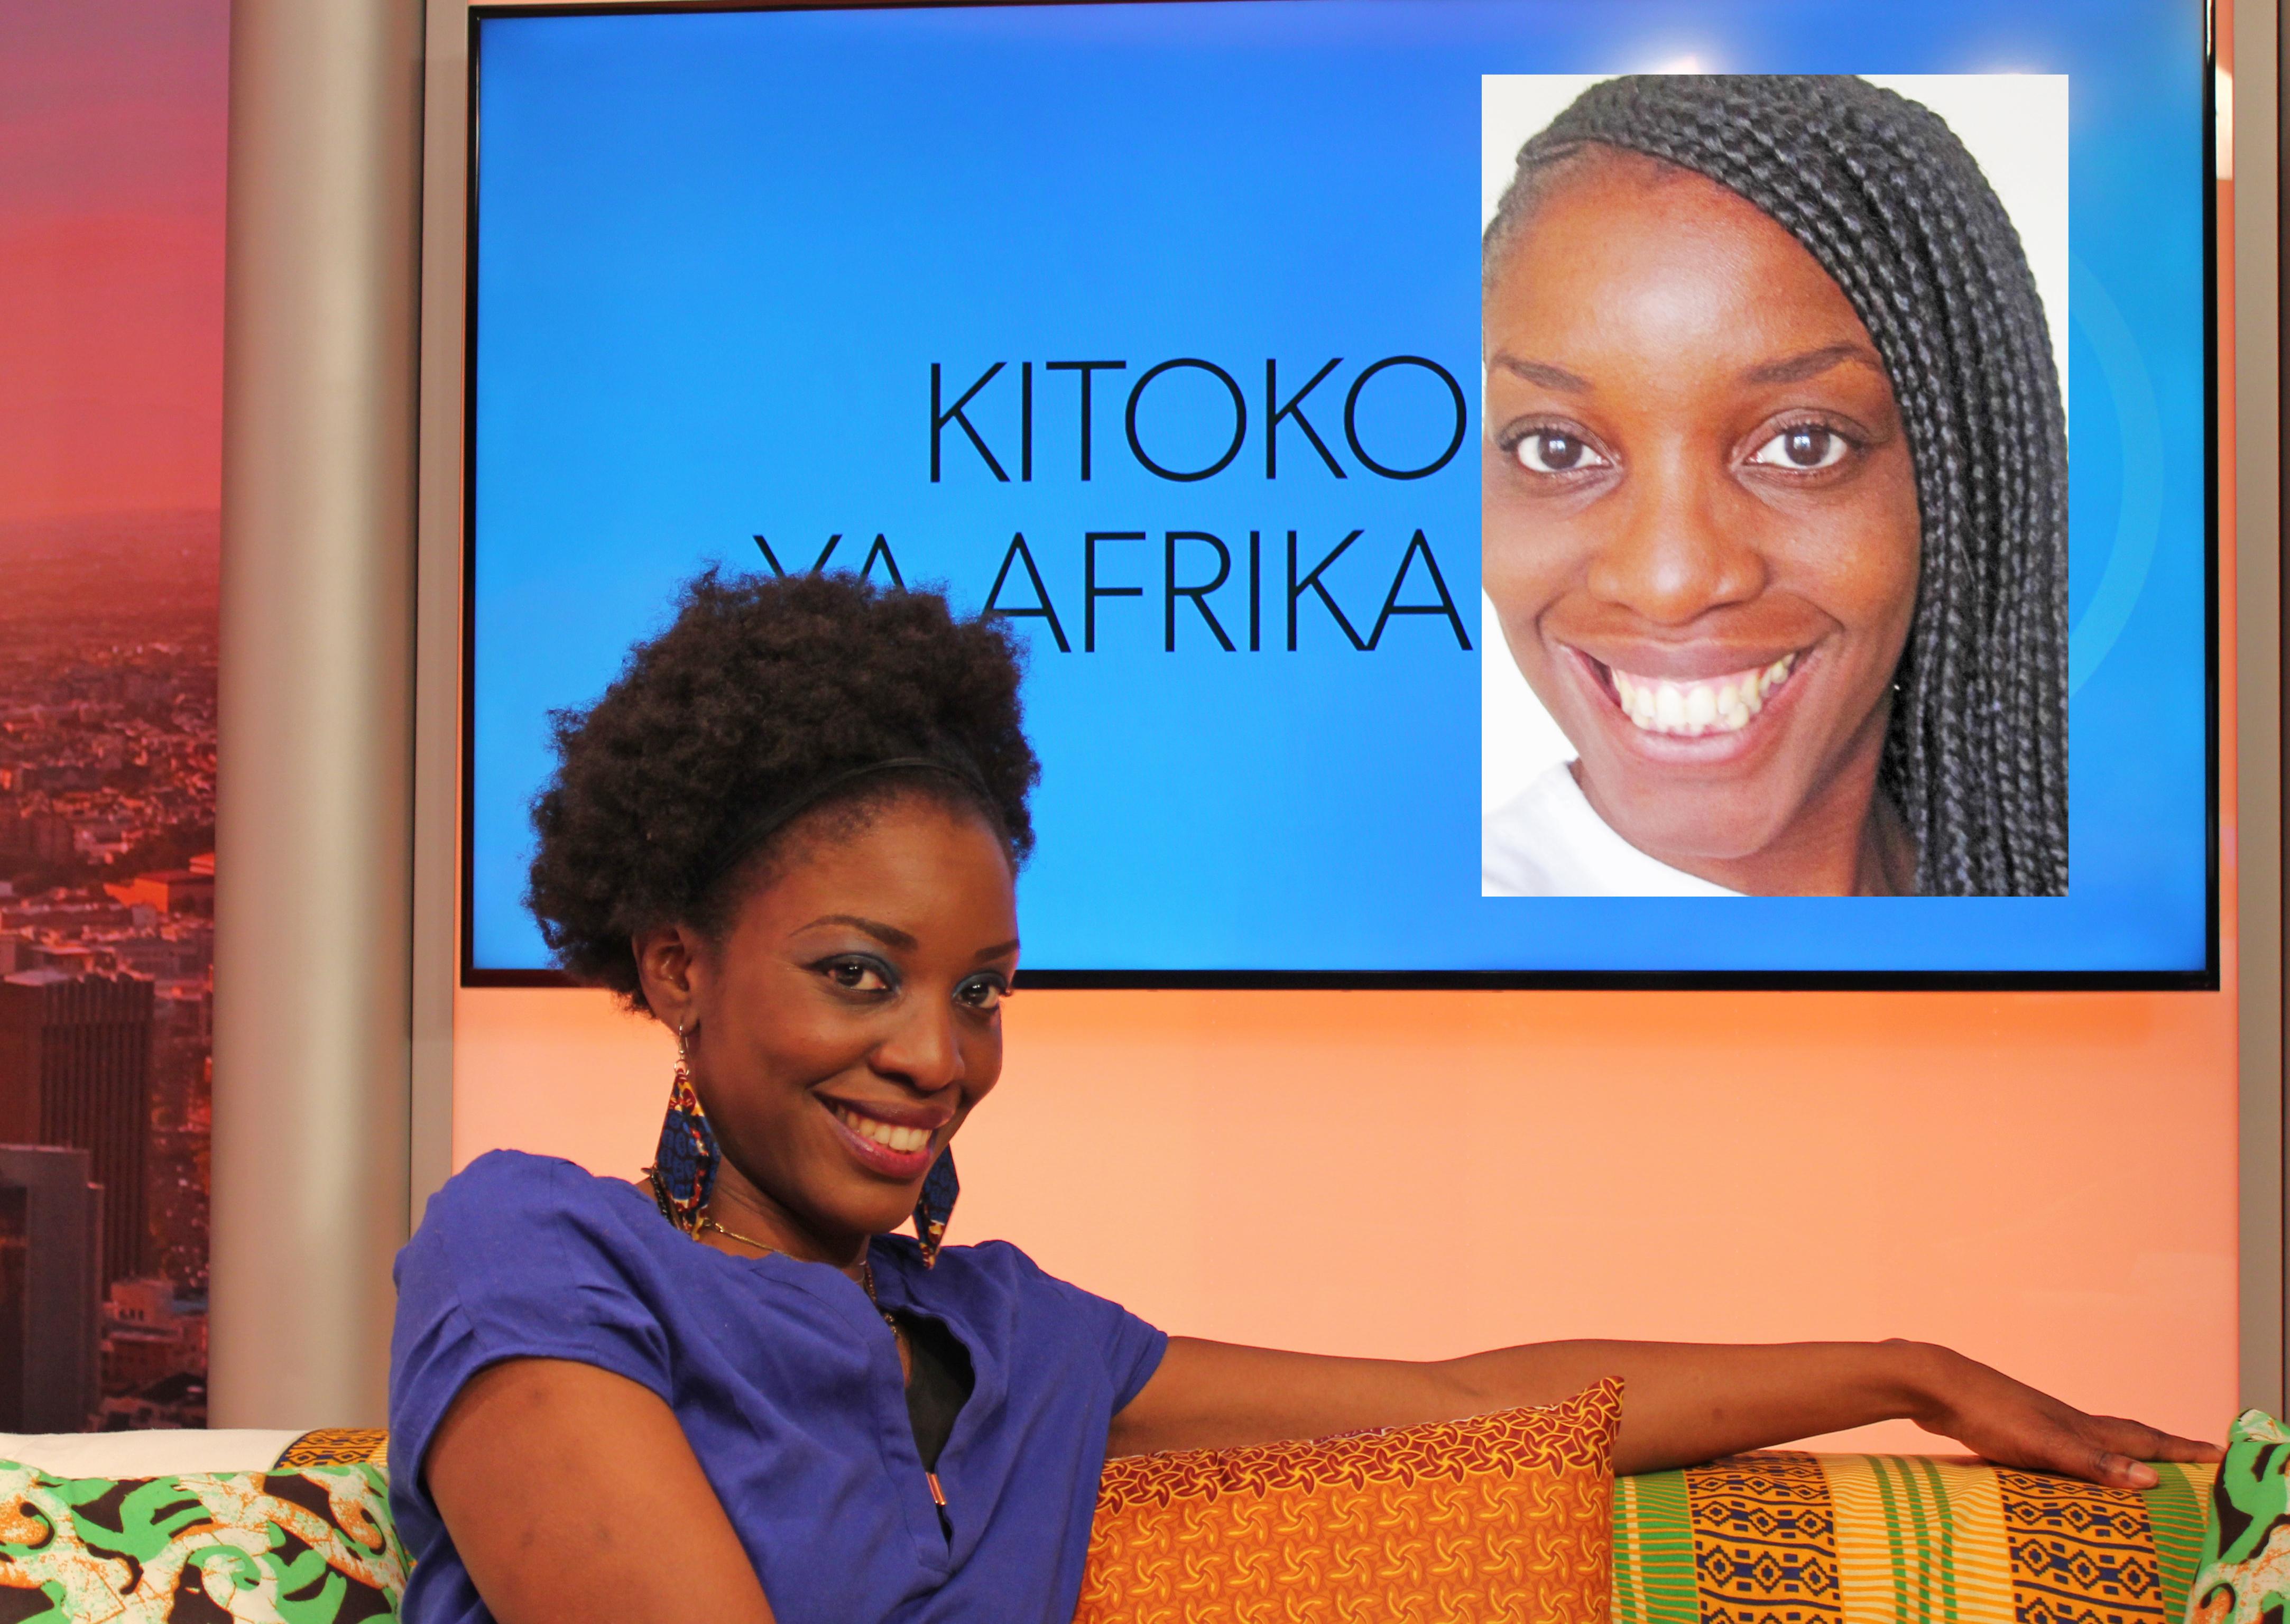 kitoko ya afrika vox afrika tresses tendances